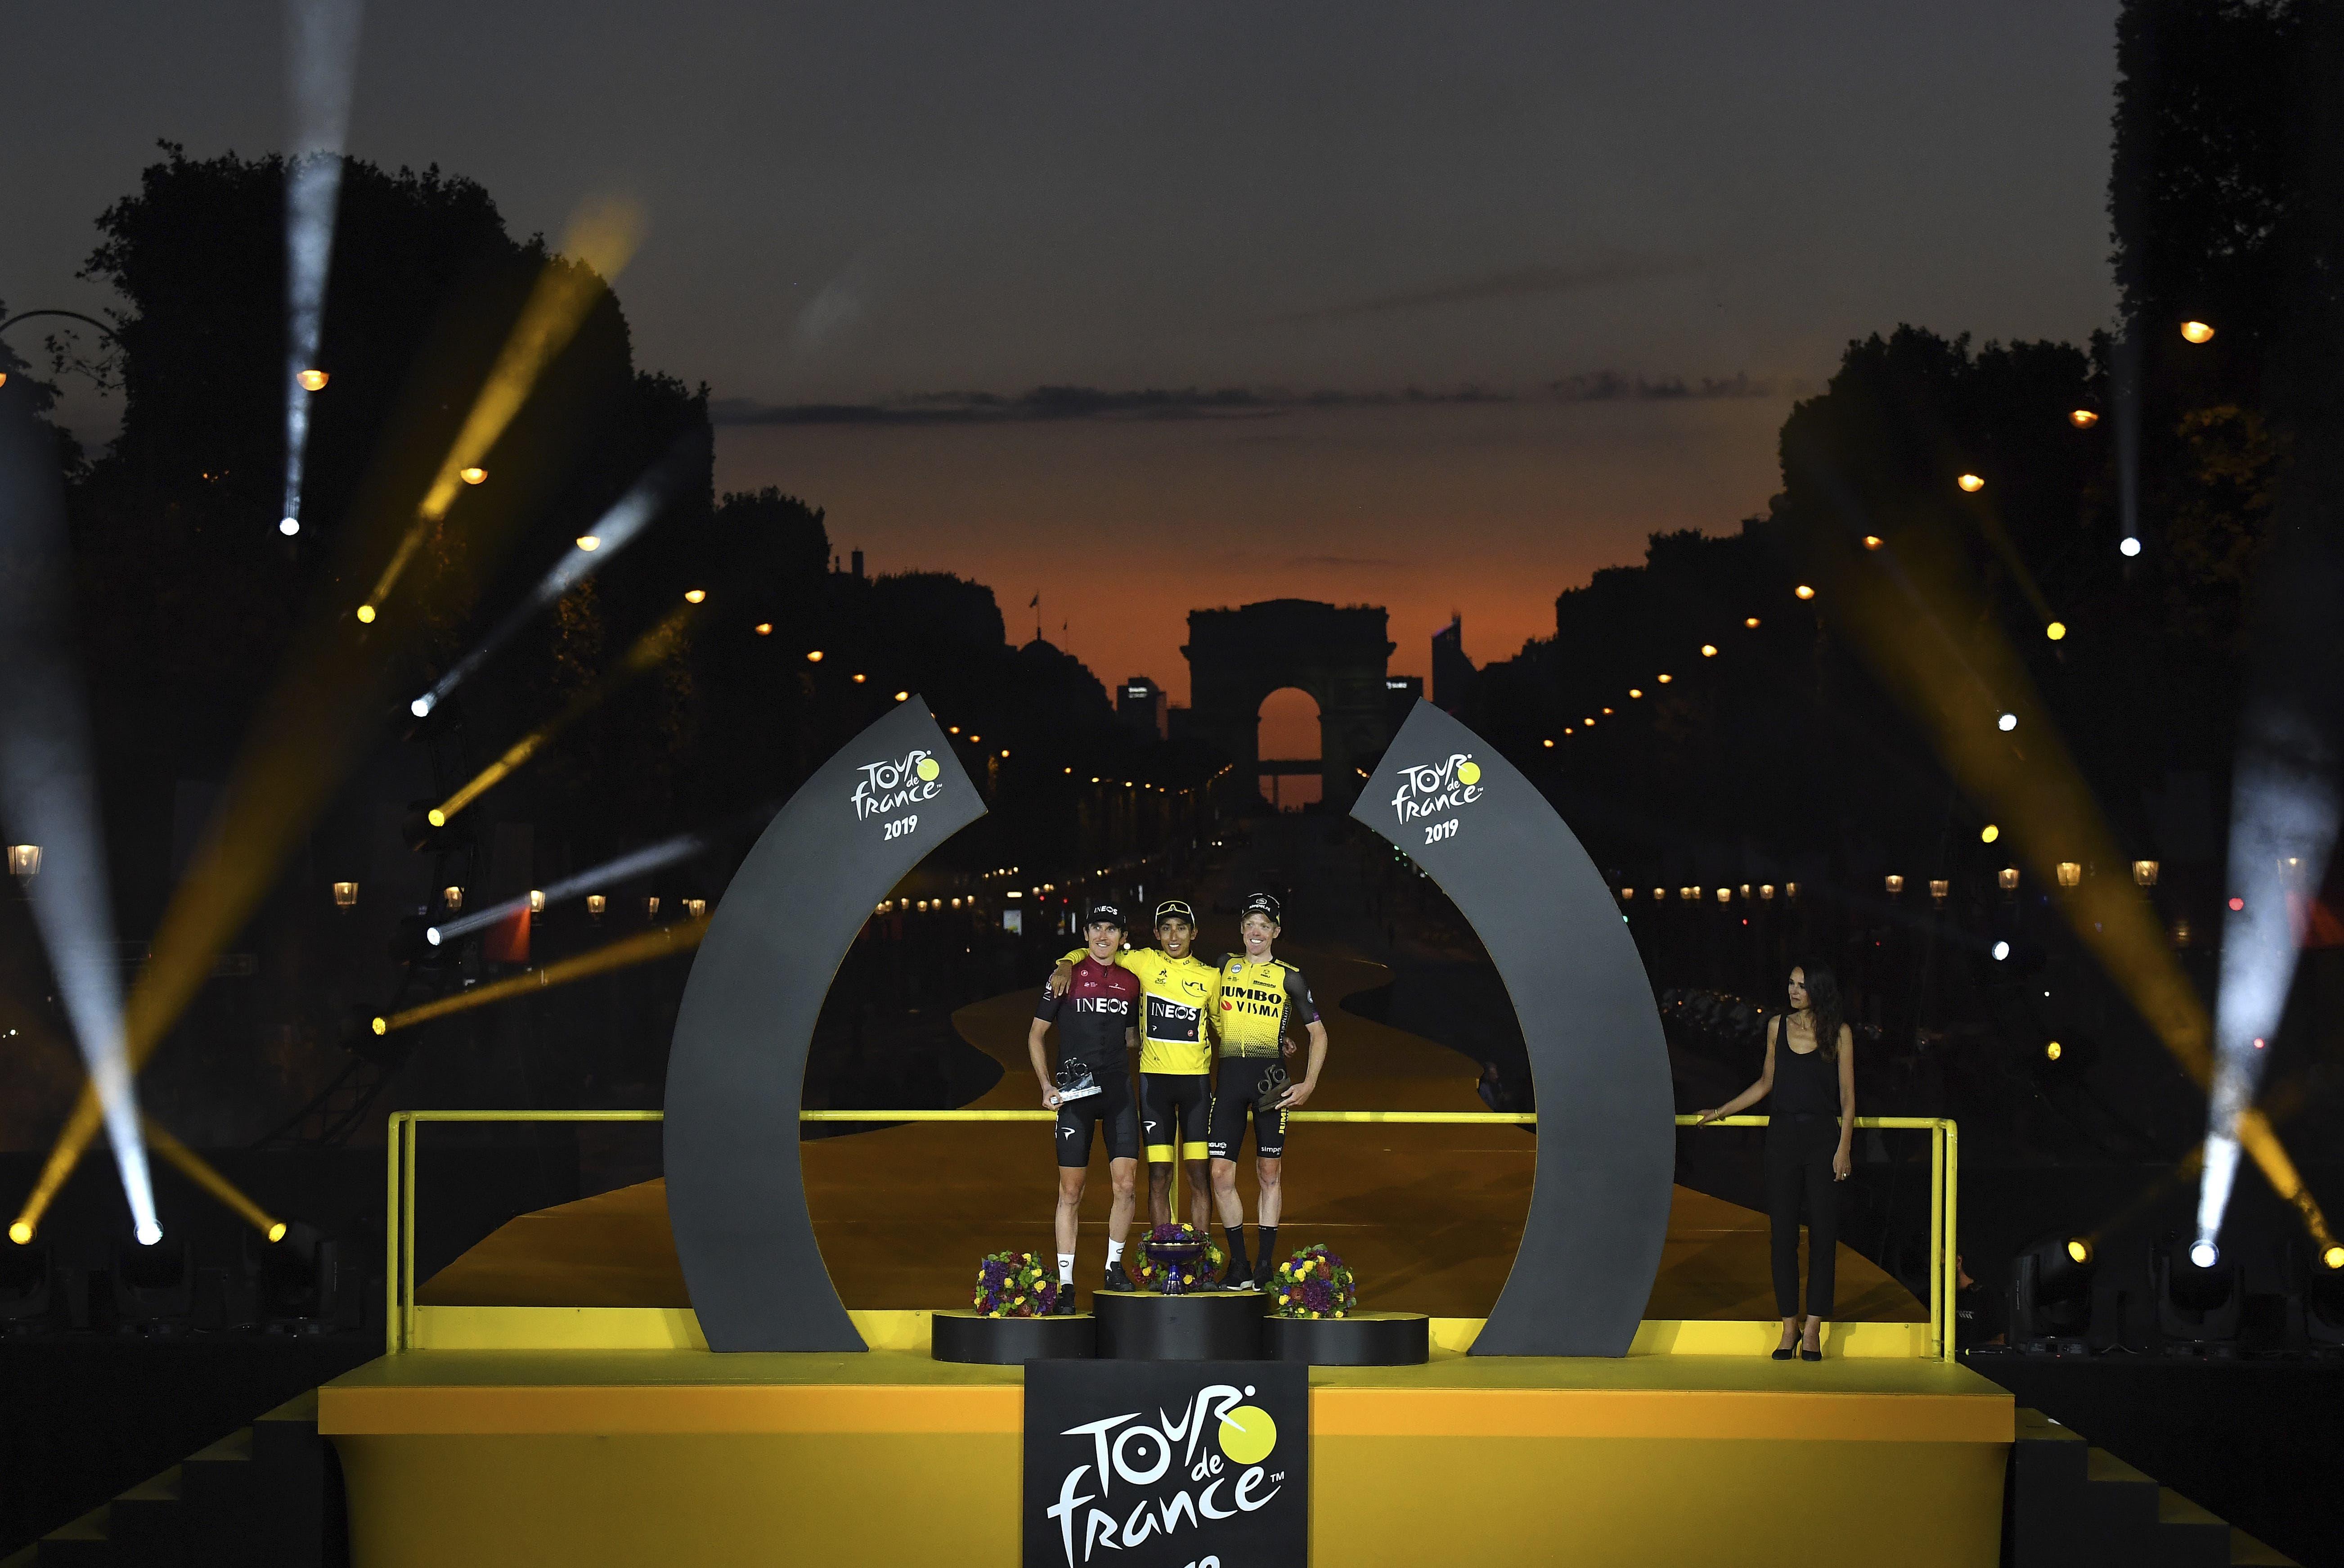 Egan Bernal (Mitte) gewinnt die Tour de France vor Geraint Thomas (links) und Steven Kruijswijk. (Bild: KEYSTONE/EPA AP POOL/THIBAULT CAMUS / POOL)